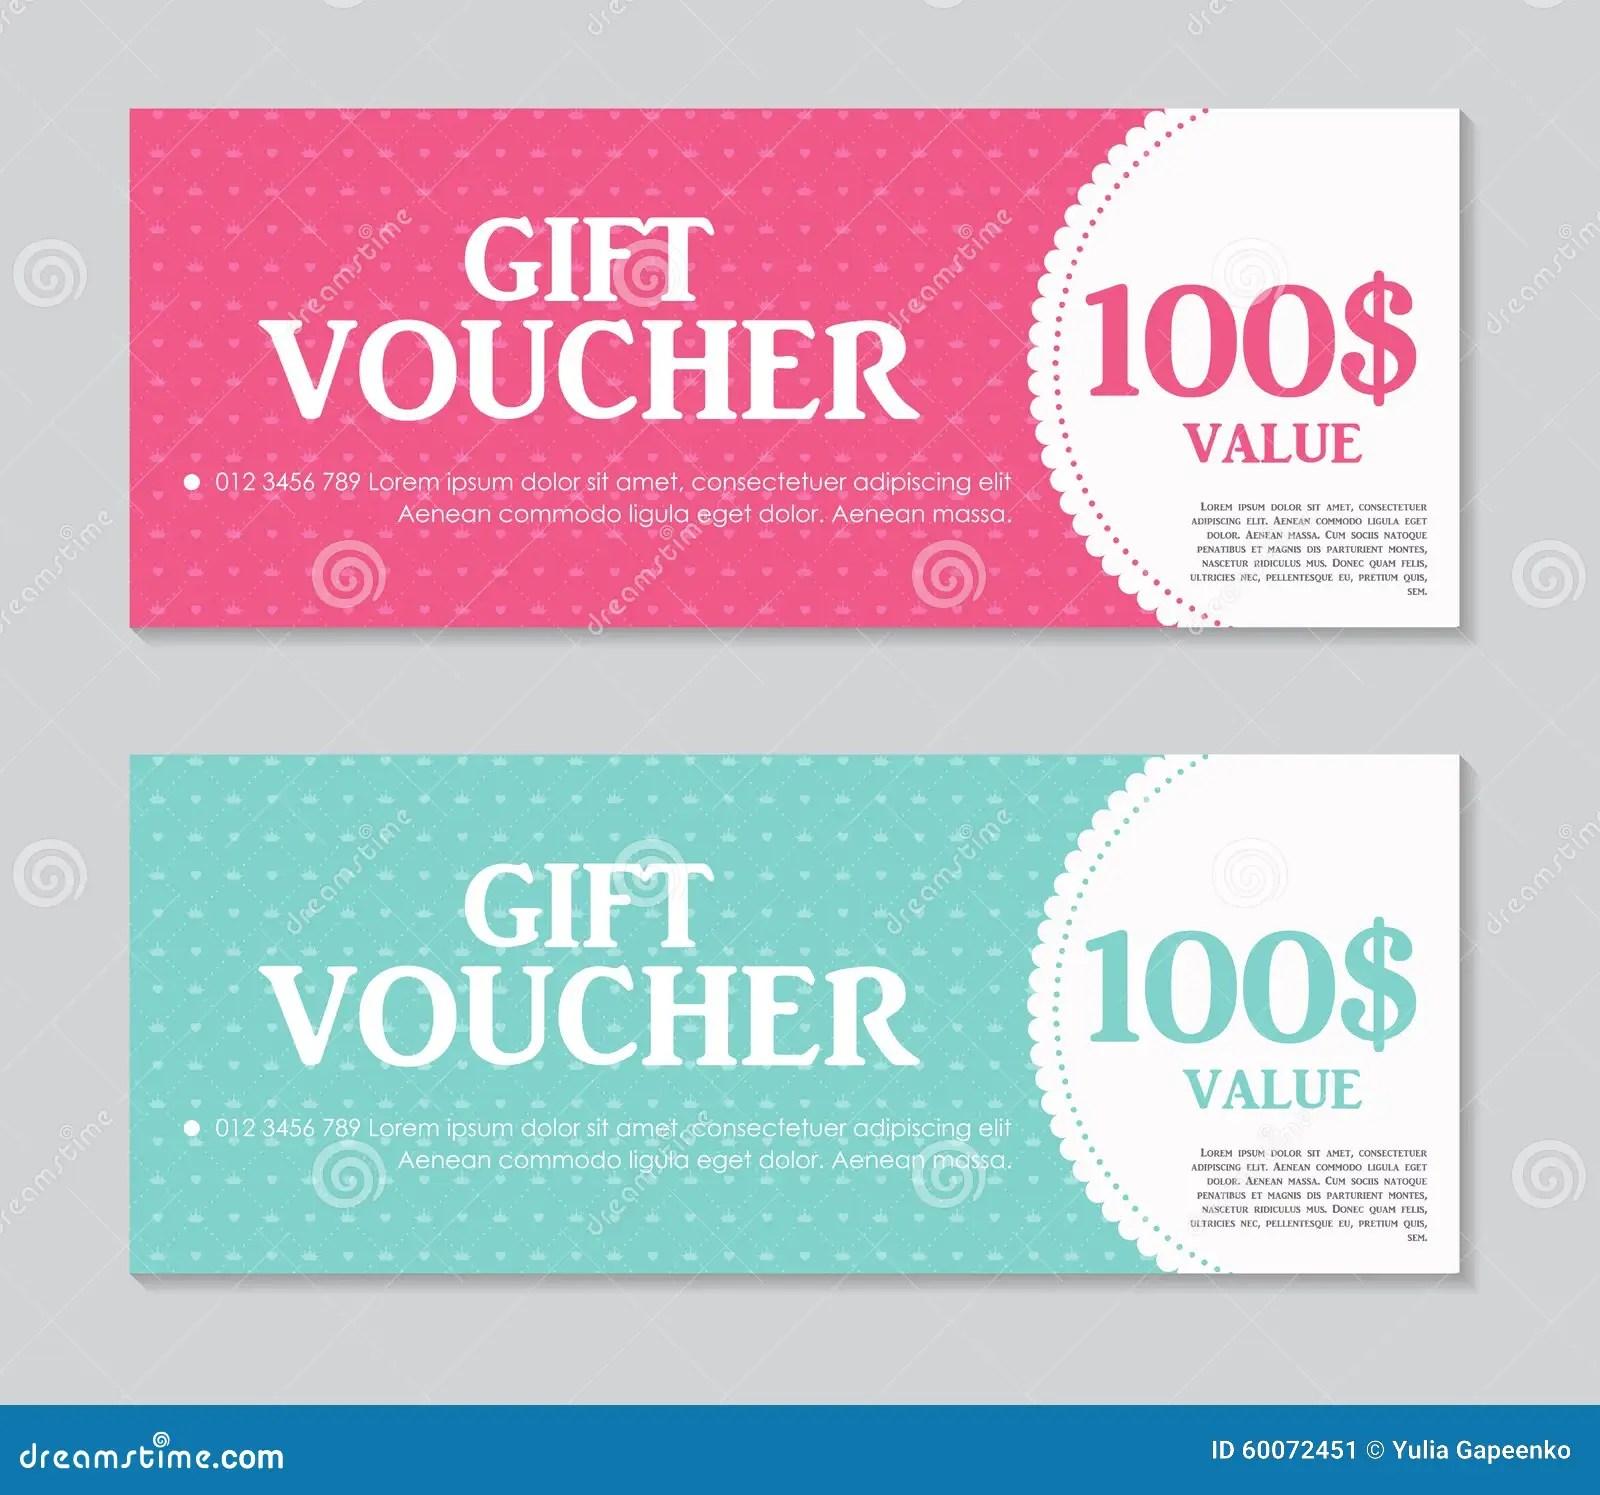 Sample Gift Vouchers letter of transmittal sample – Examples of Gift Vouchers